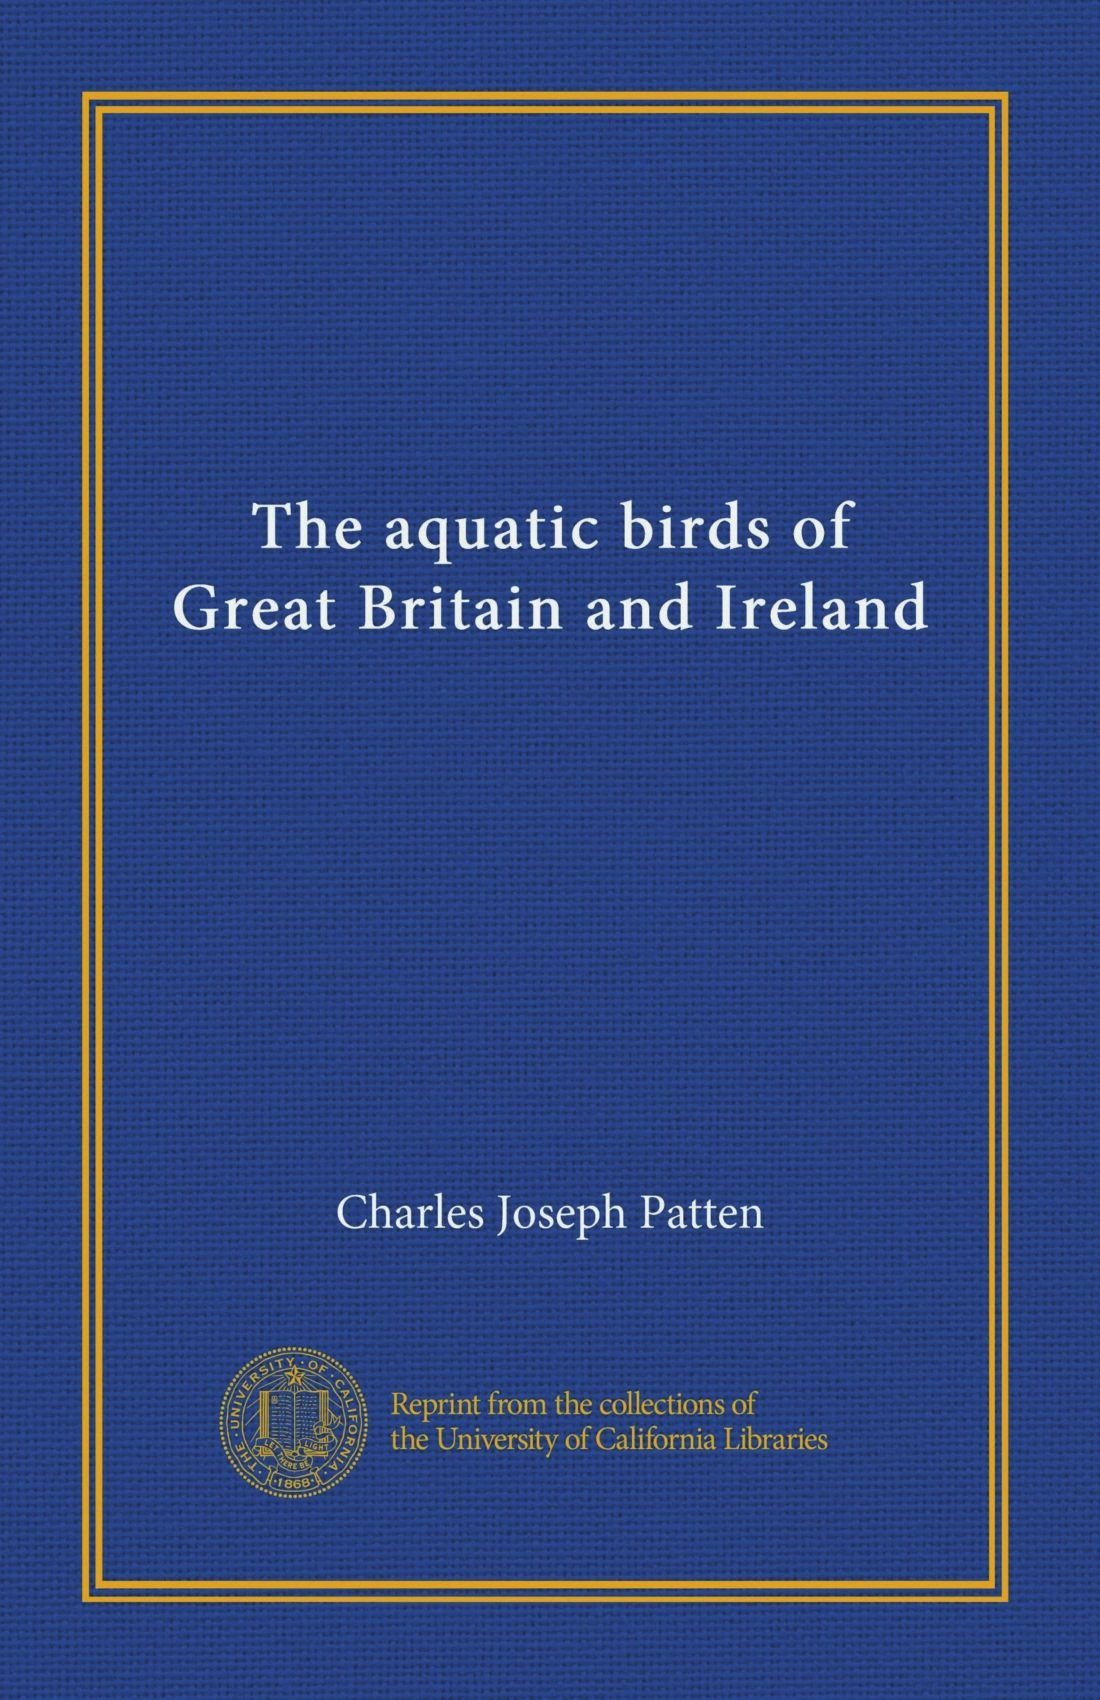 Download The aquatic birds of Great Britain and Ireland pdf epub